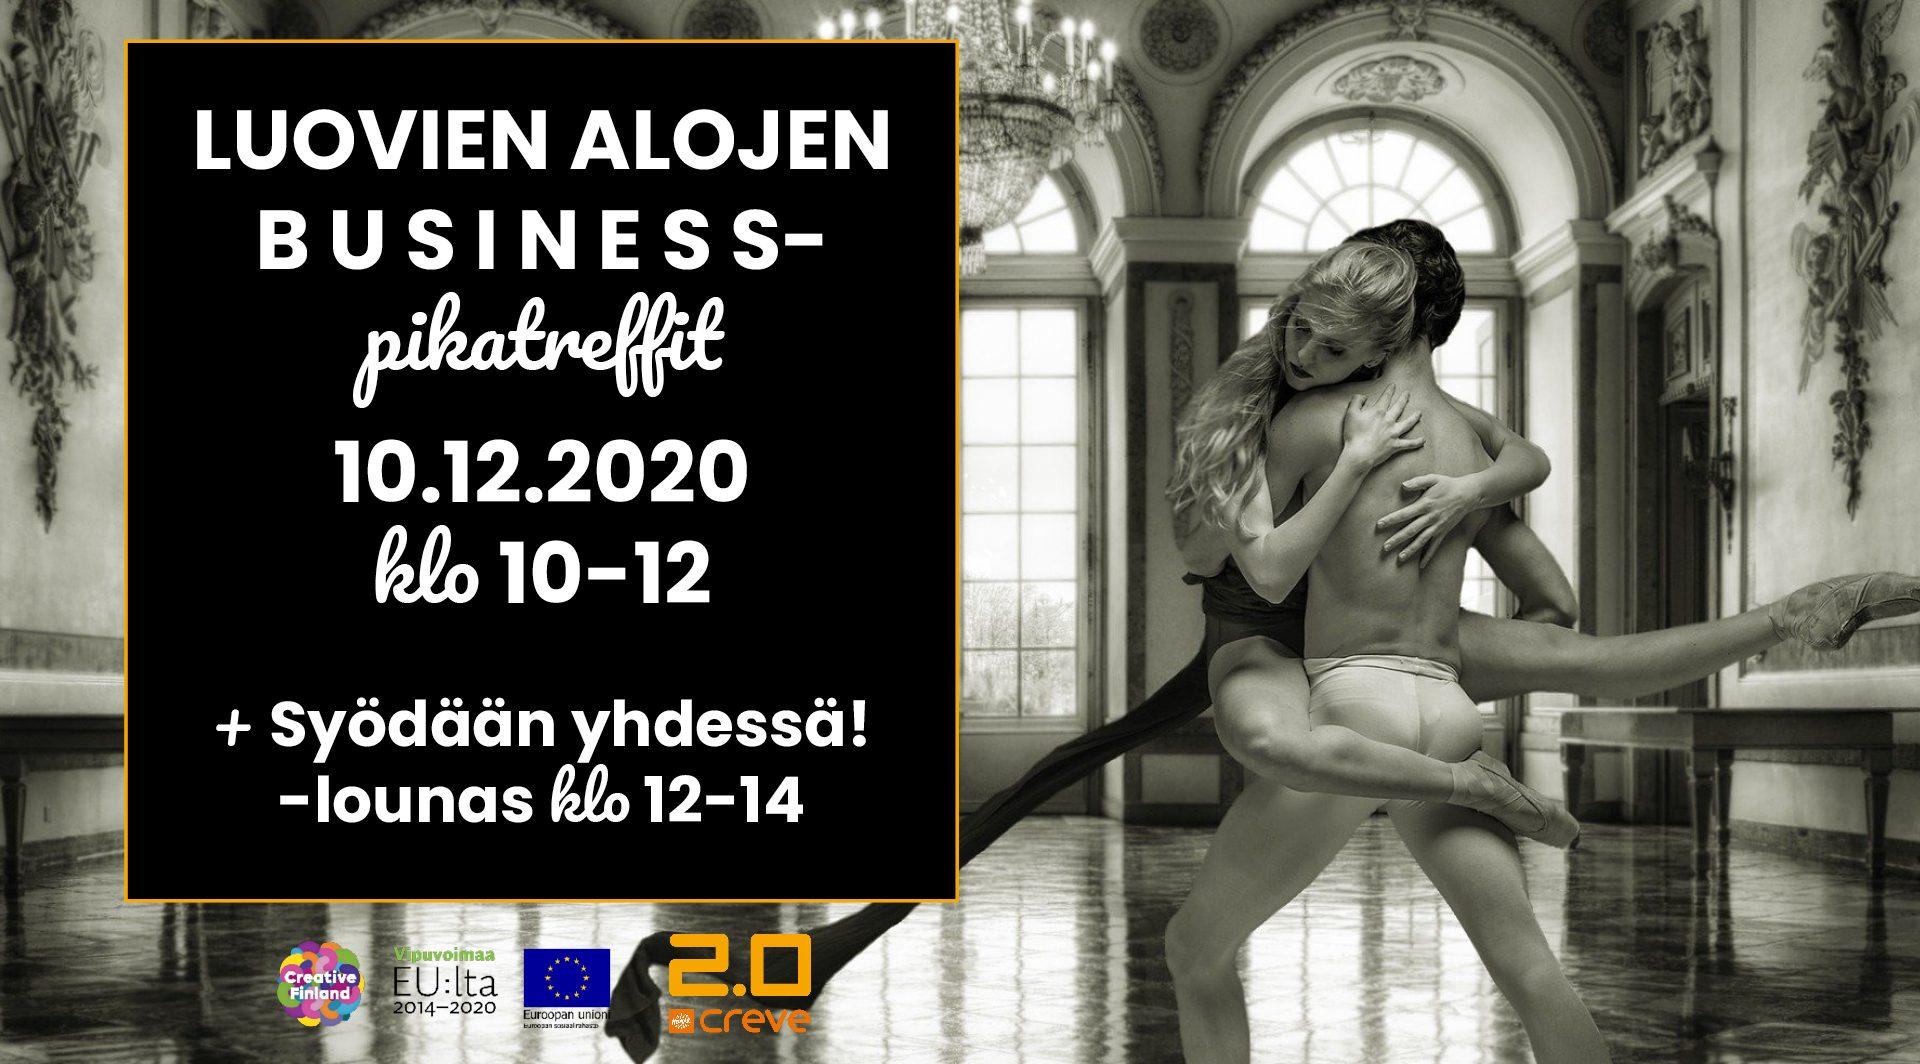 Kuvituskuva: Business-pikatreffit ja lounas 10.12.2020 klo 10-14